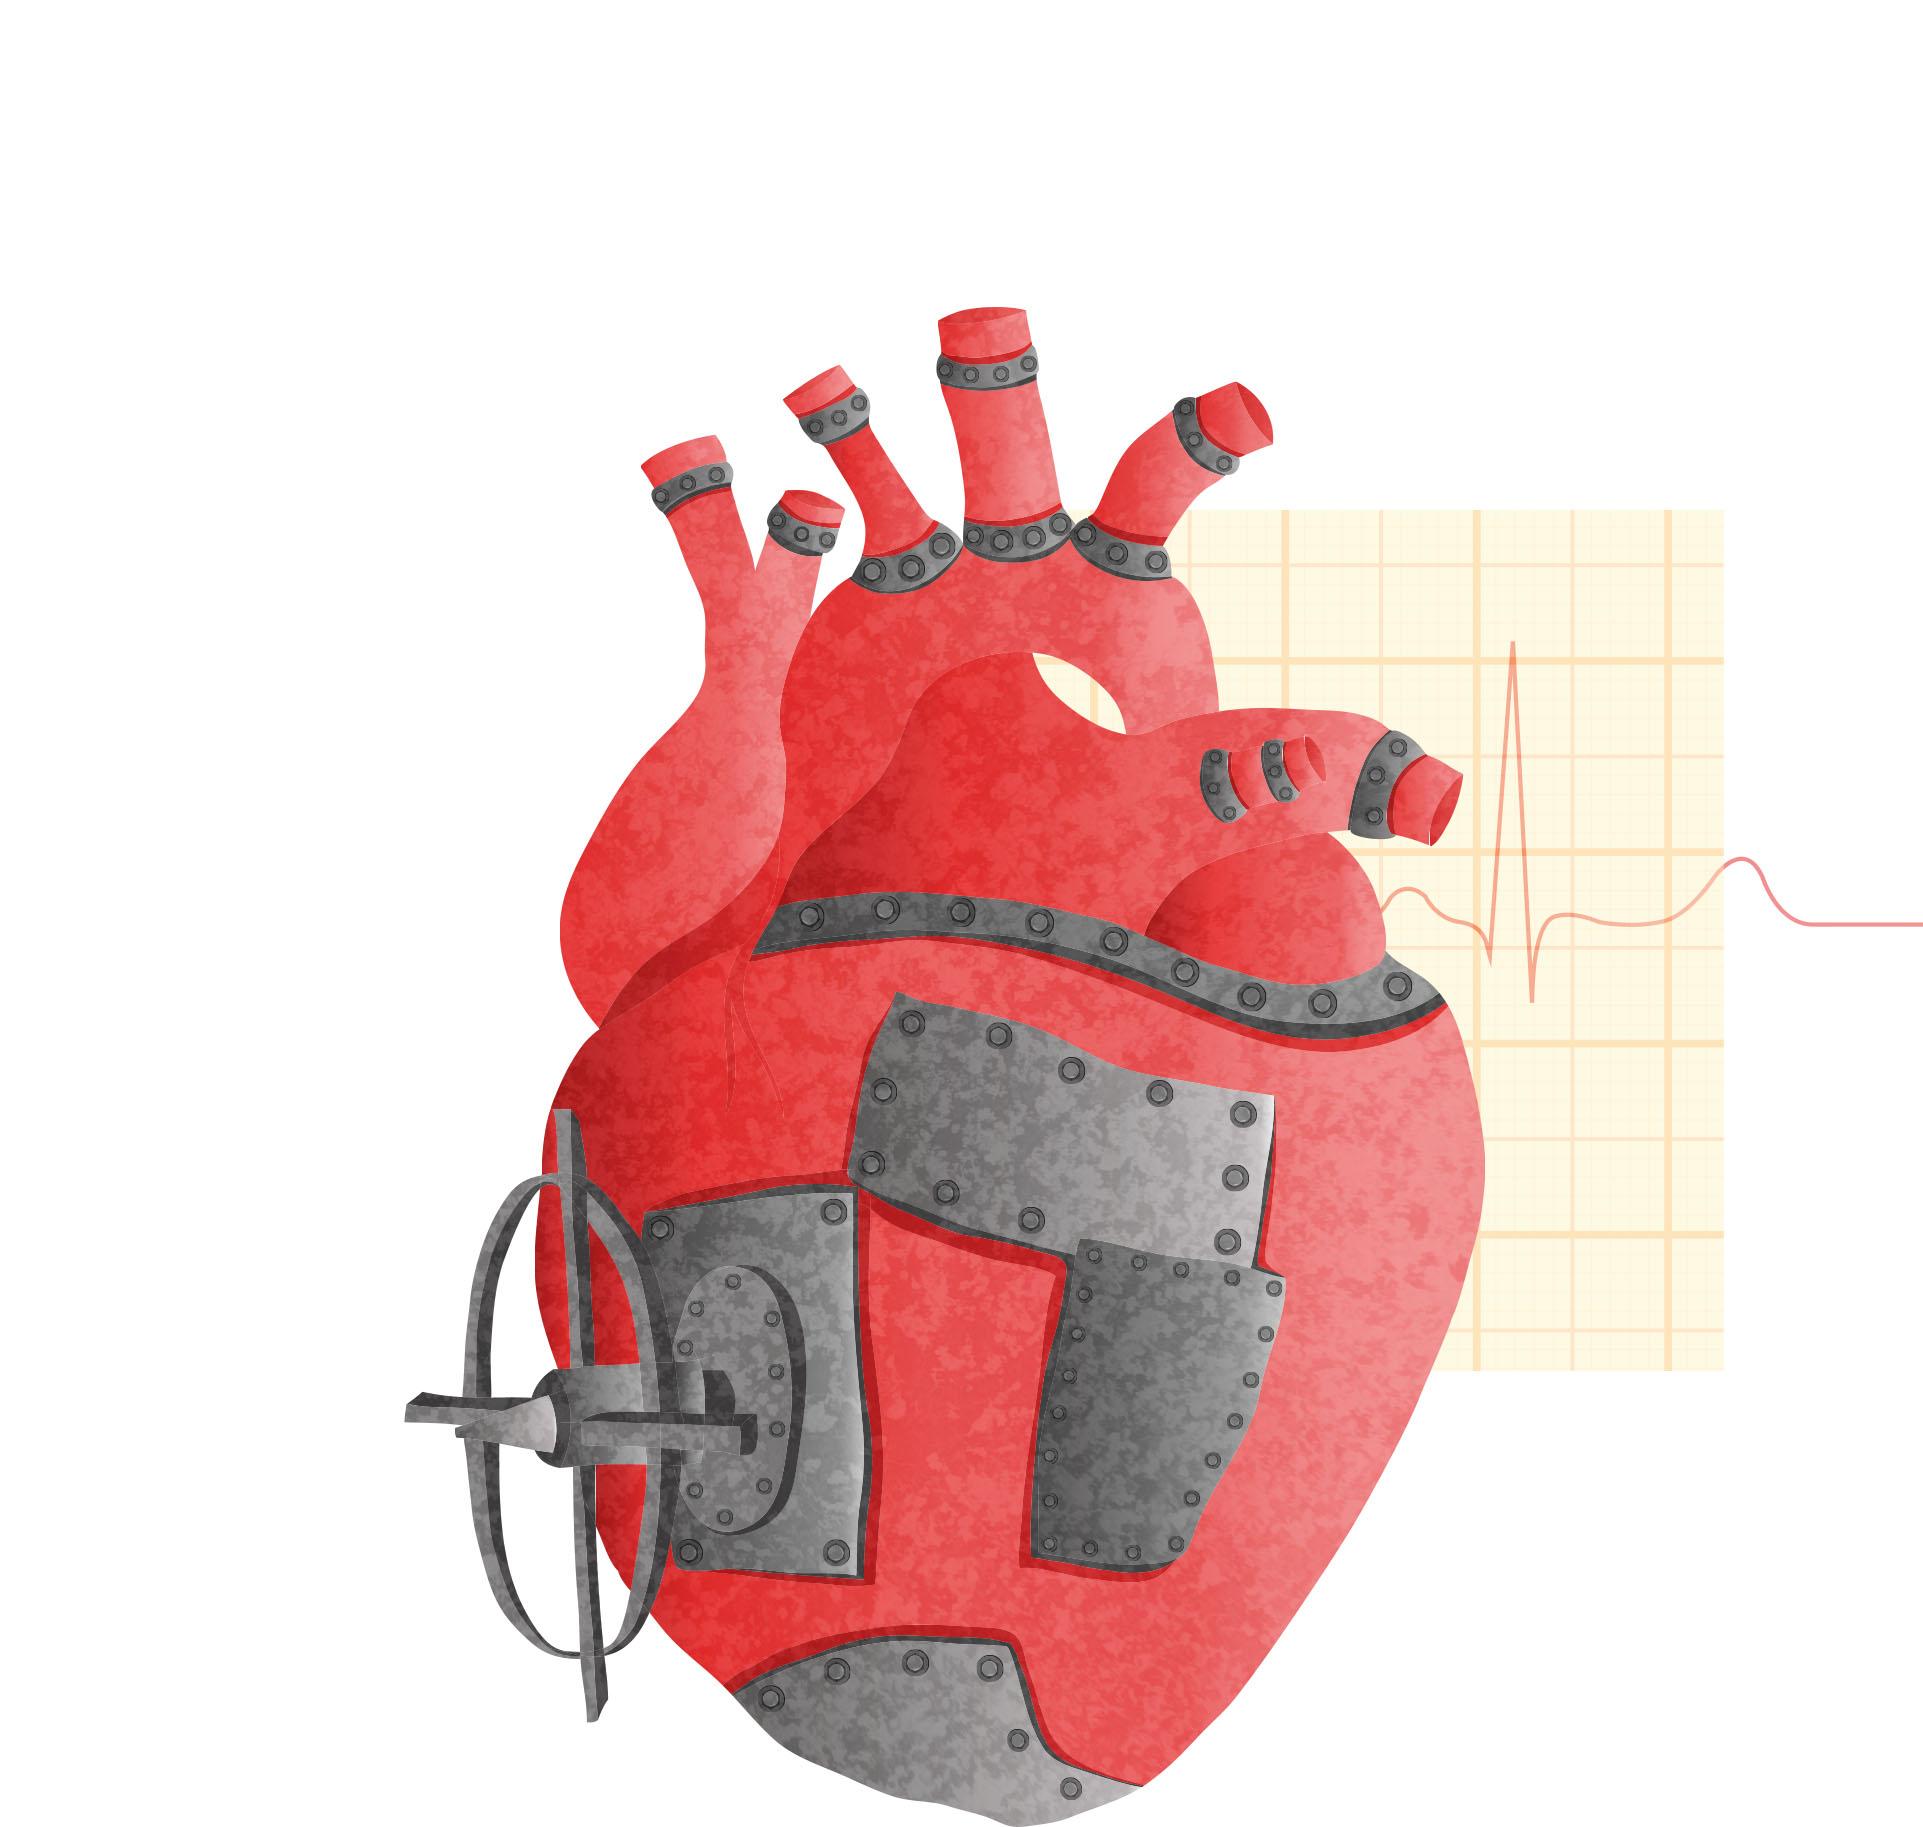 Mechanic of the heart